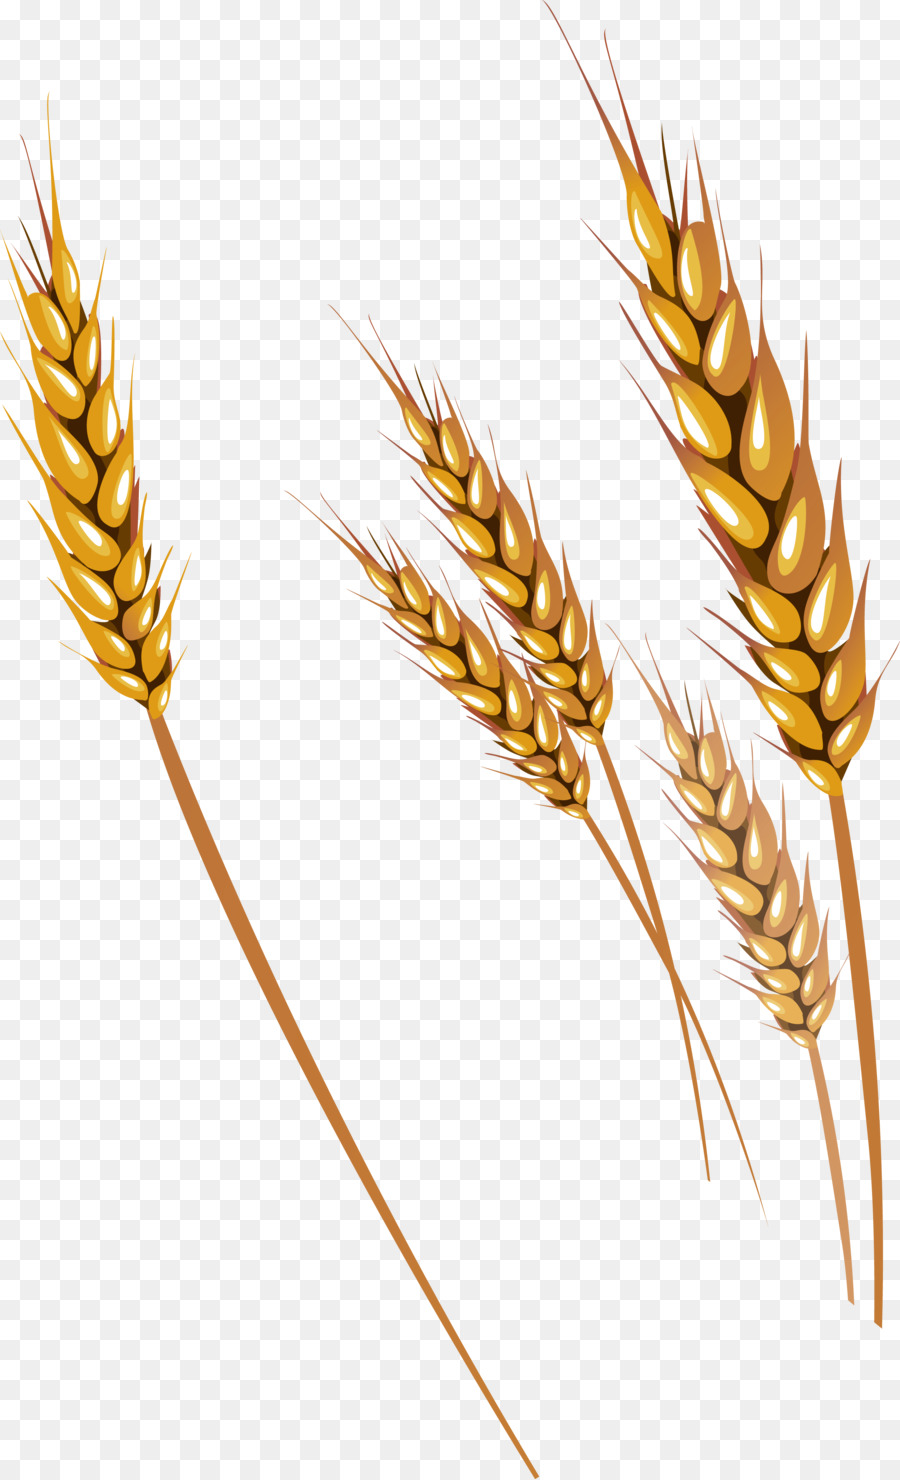 Wheat clipart piece wheat. Cartoon graphics plant transparent